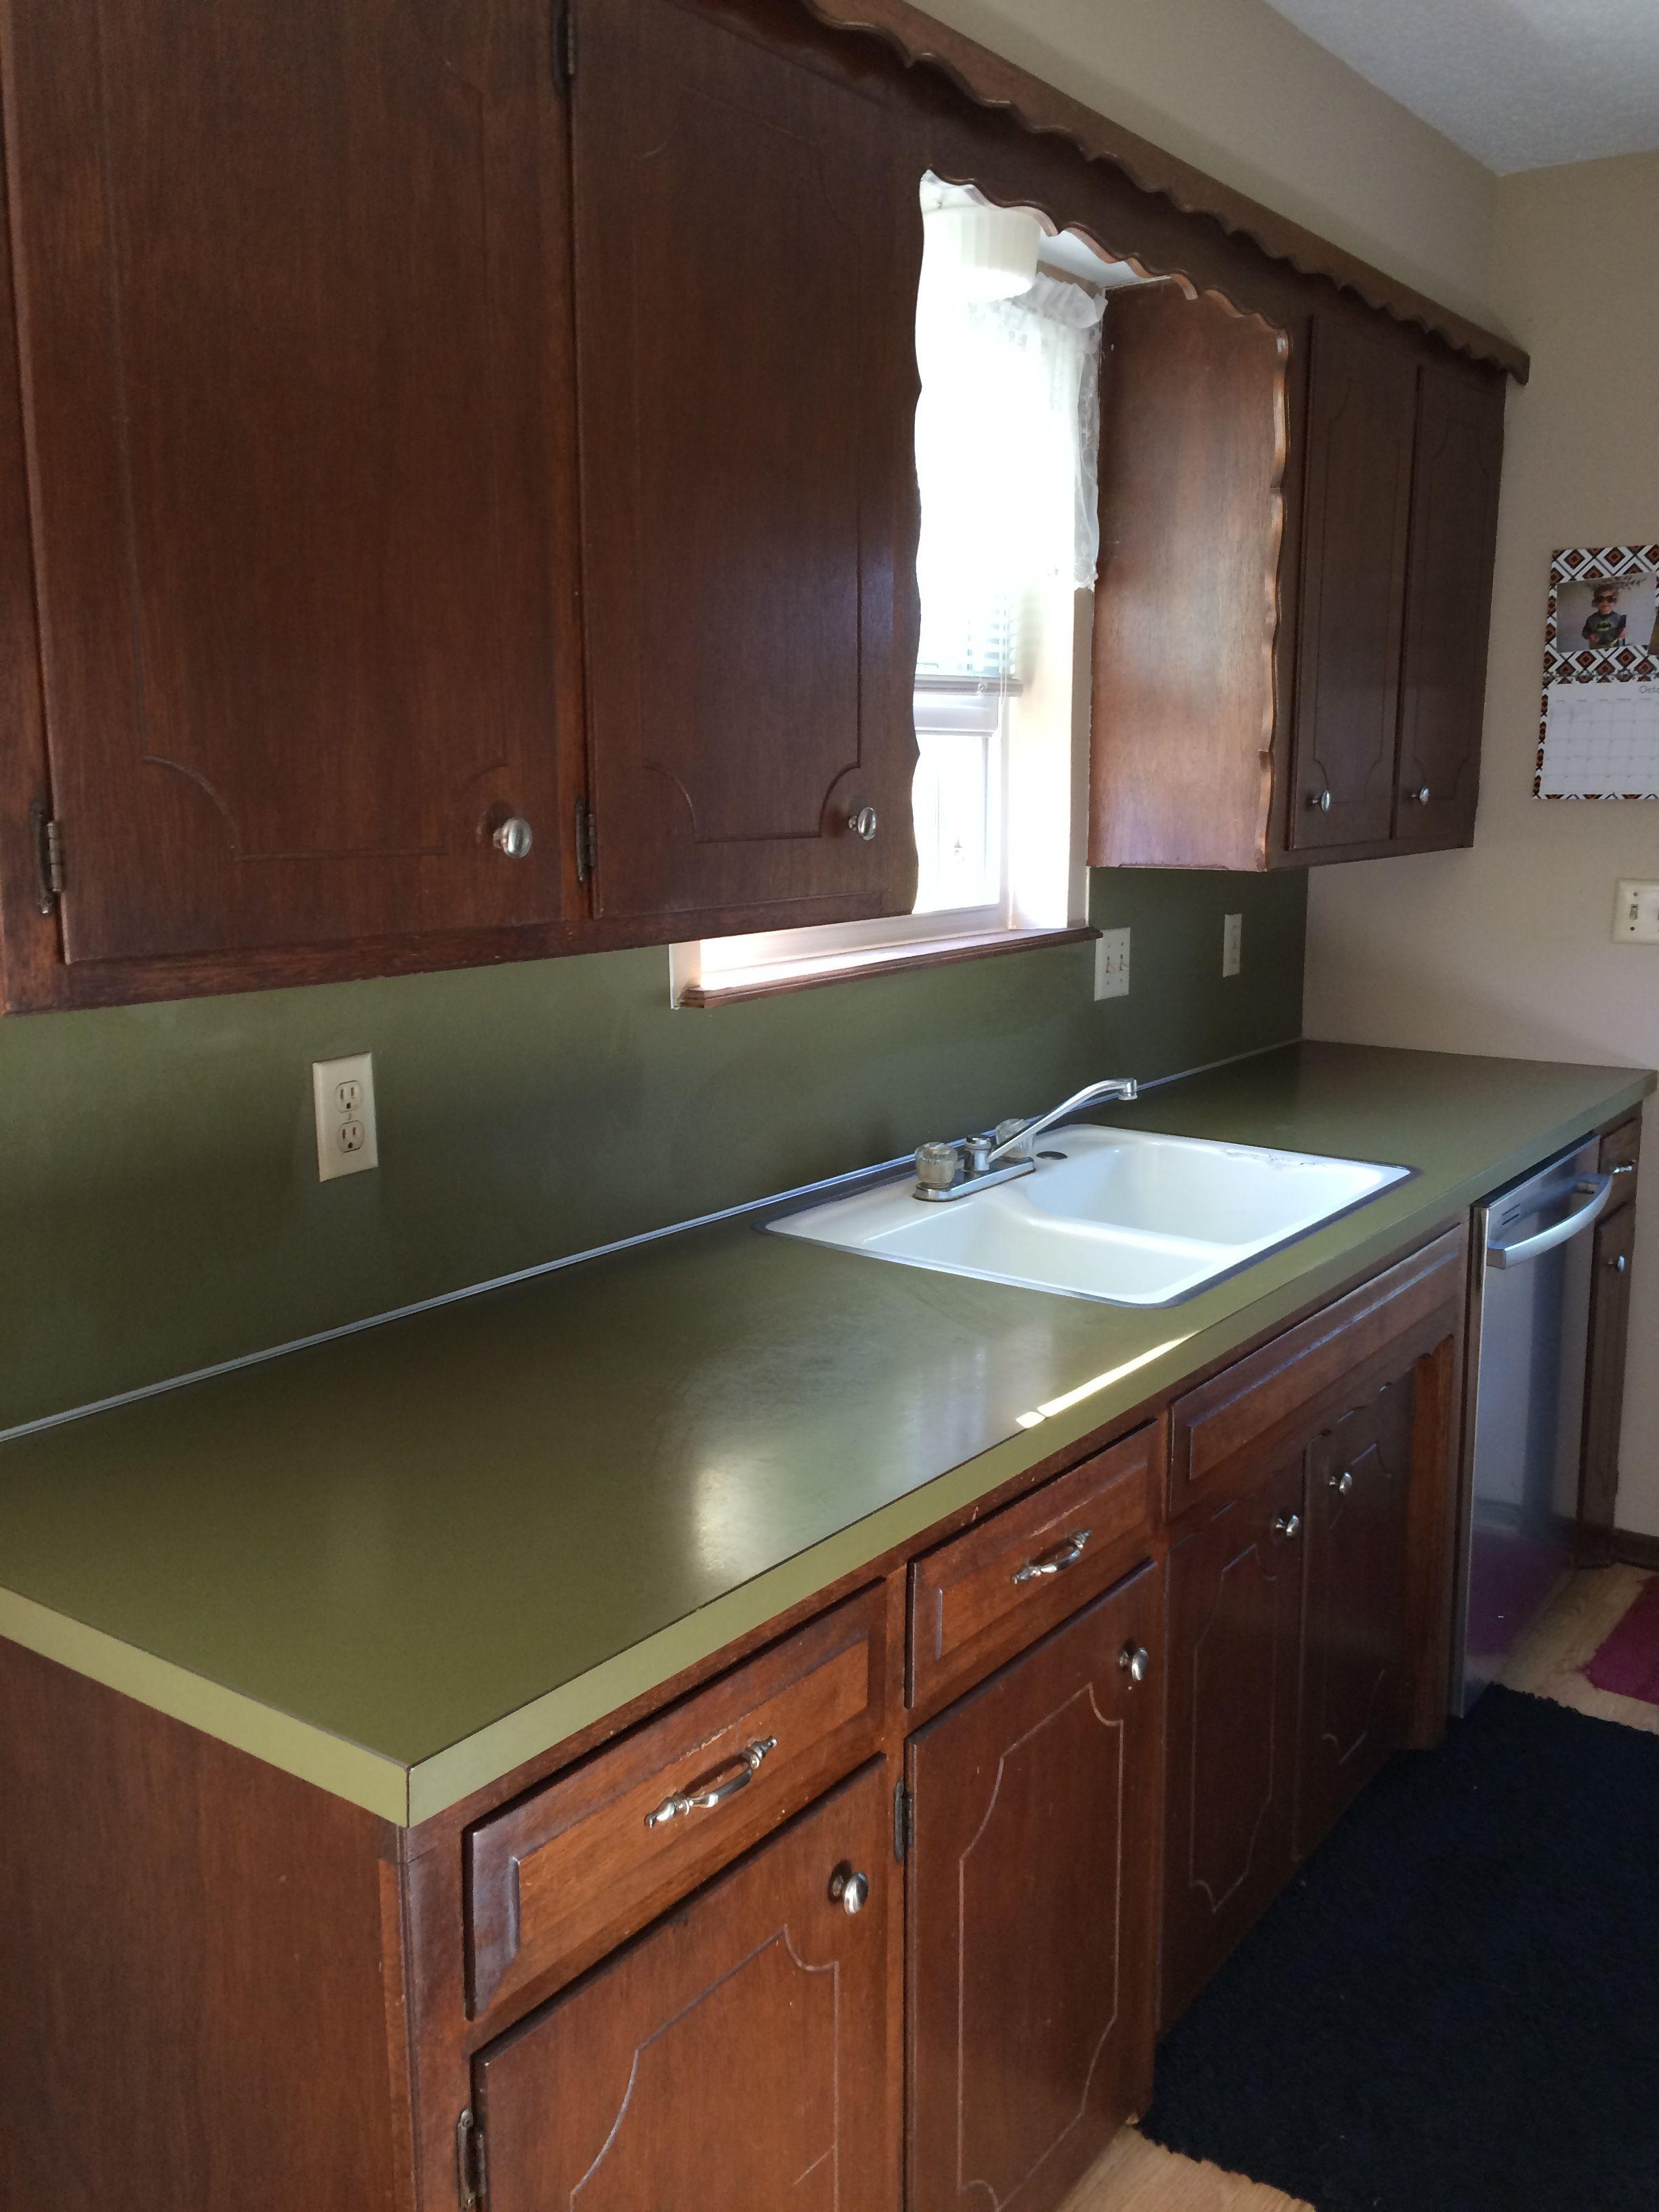 Original Avocado Green Laminate Countertop We Had These Still Do Green Countertops Countertops House Interior